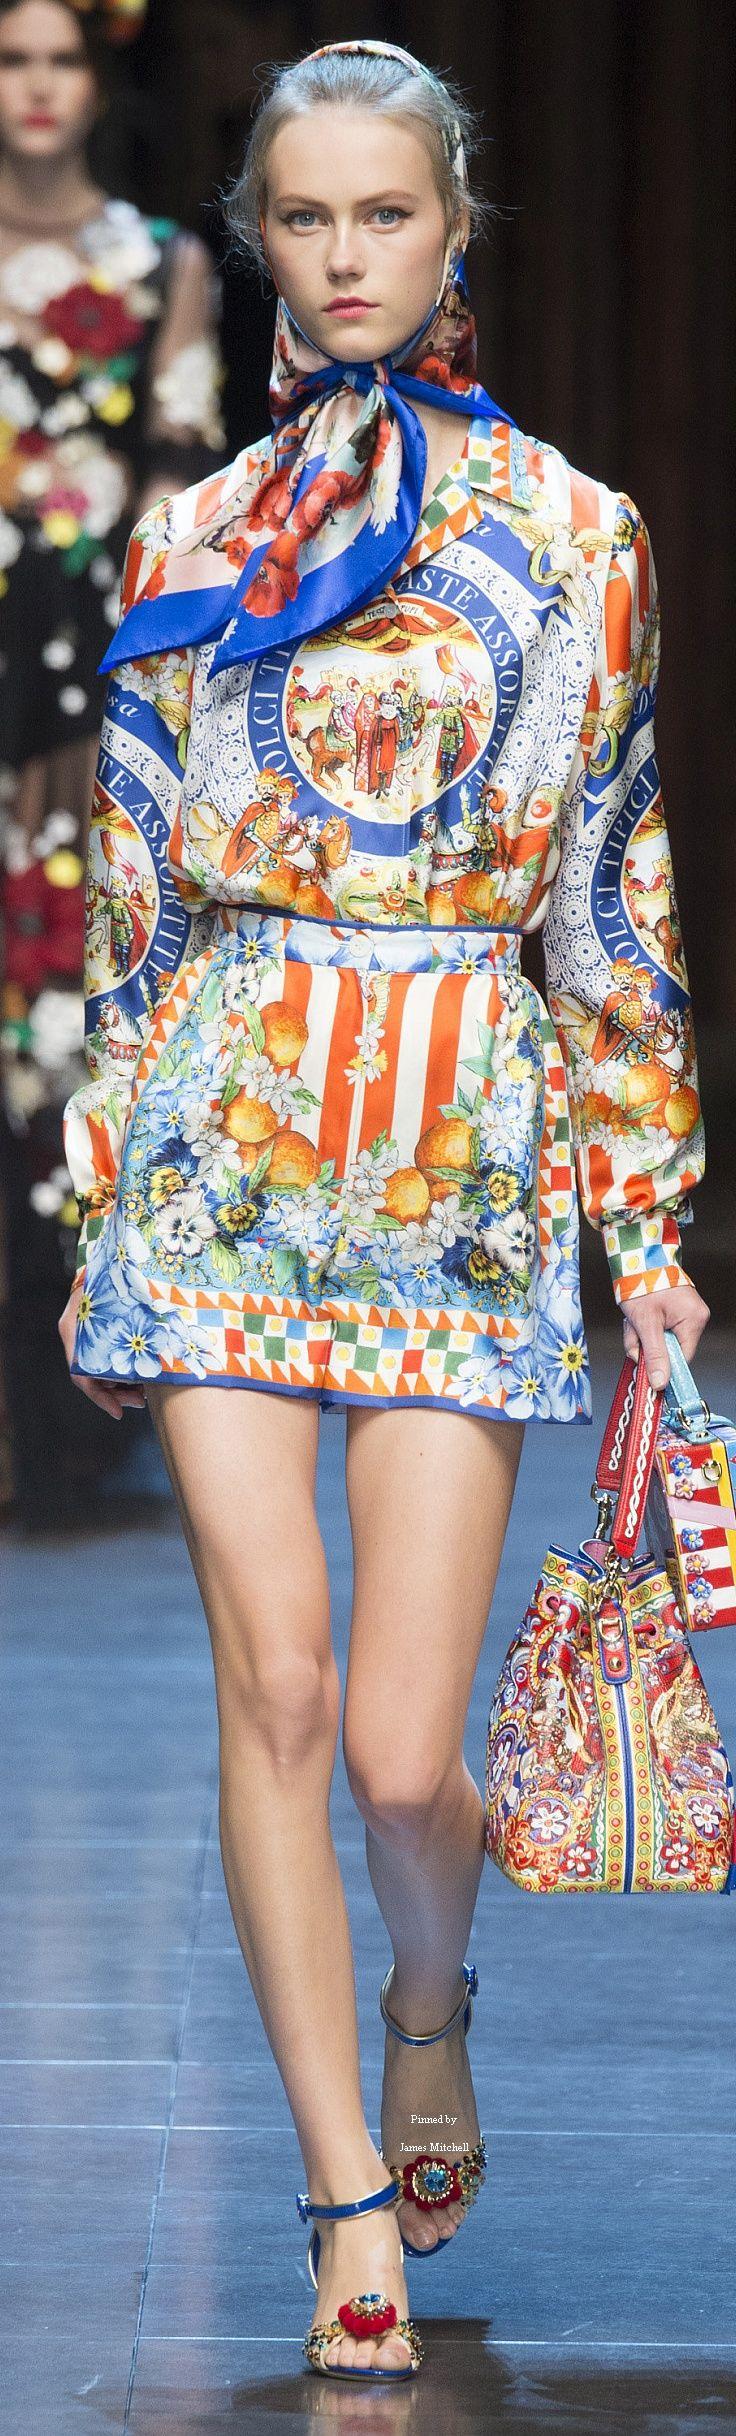 Dolce & Gabbana Collection Spring 2016 Ready-to-Wear KOONN MODULAR CONCEPT WWW.KOONN.COM